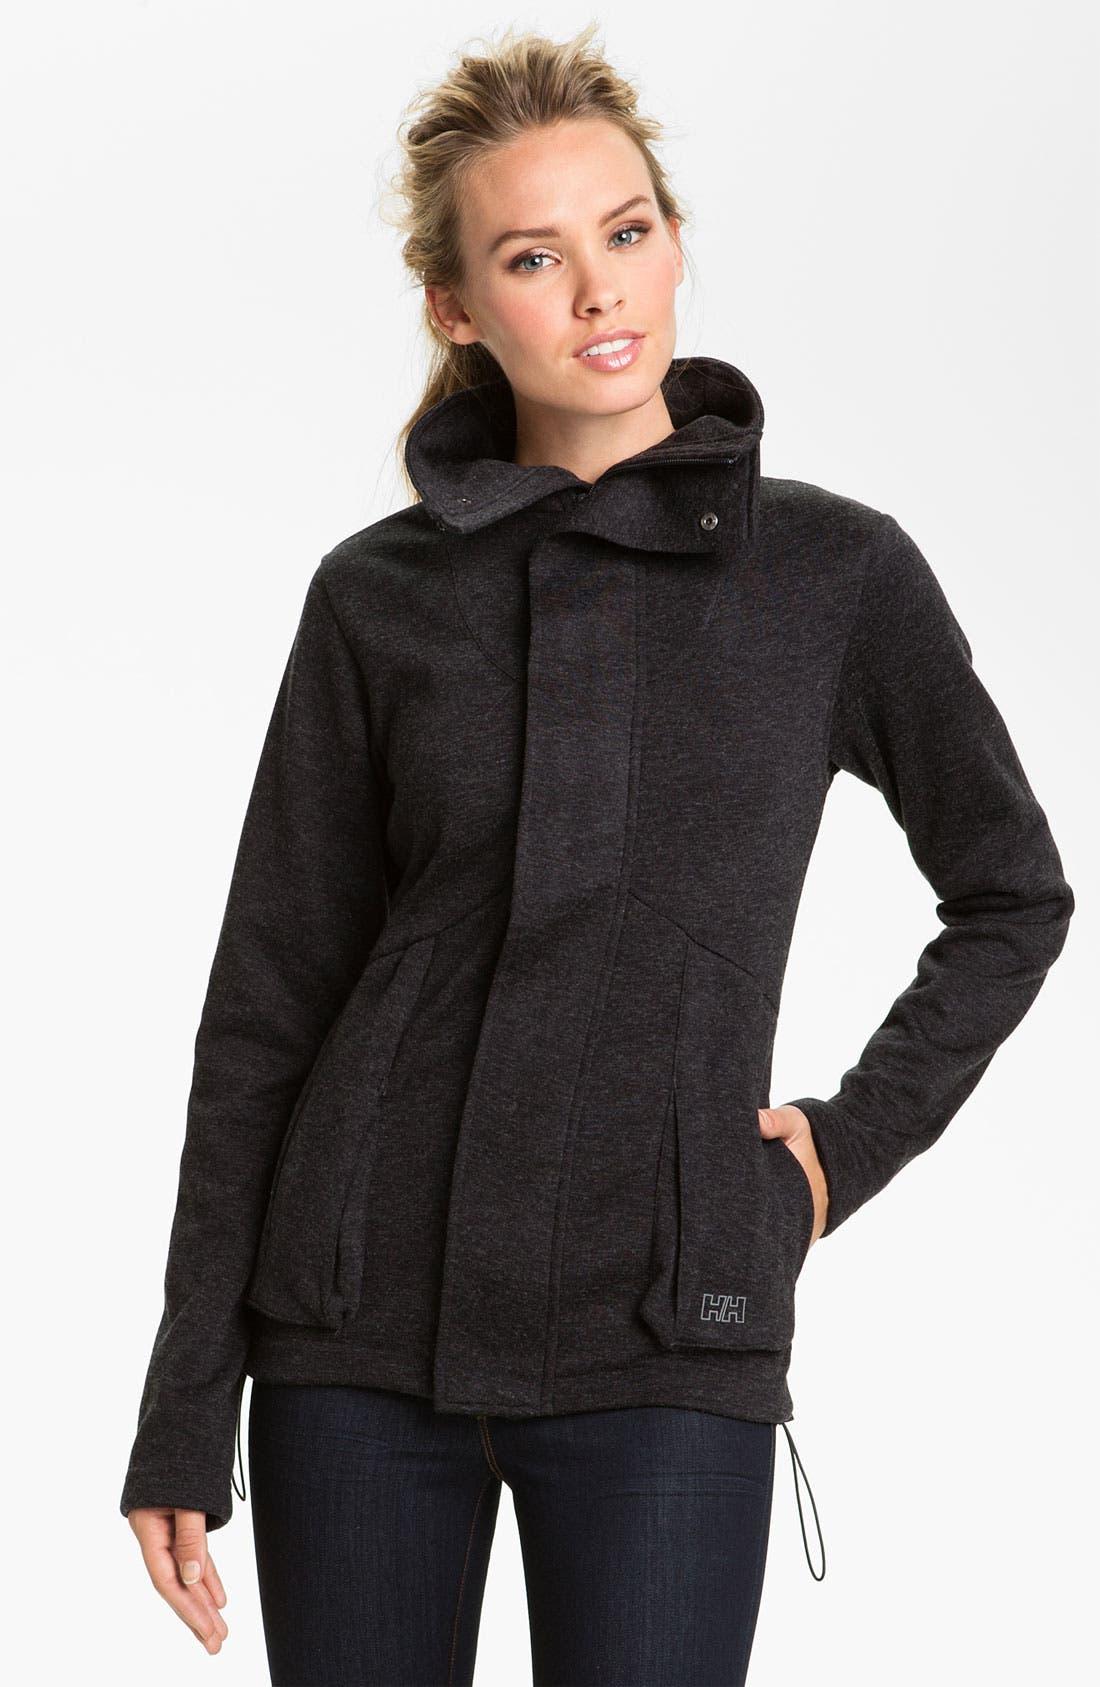 Alternate Image 1 Selected - Helly Hansen 'Sheer Bliss' Jacket